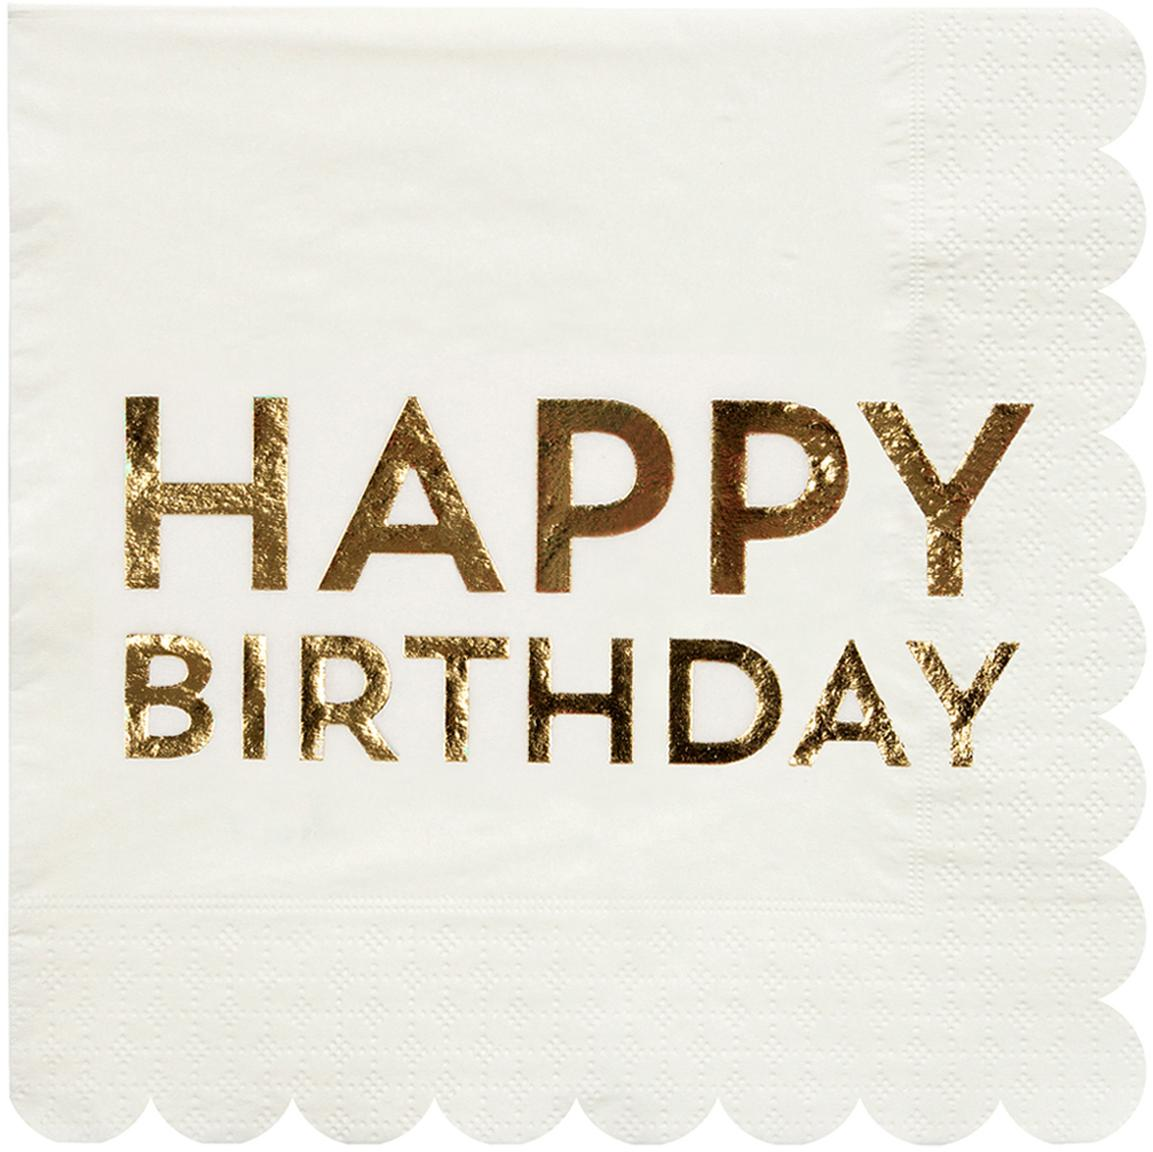 Papier-Servietten Birthday, 16 Stück, Papier, Weiss, Goldfarben, 33 x 33 cm